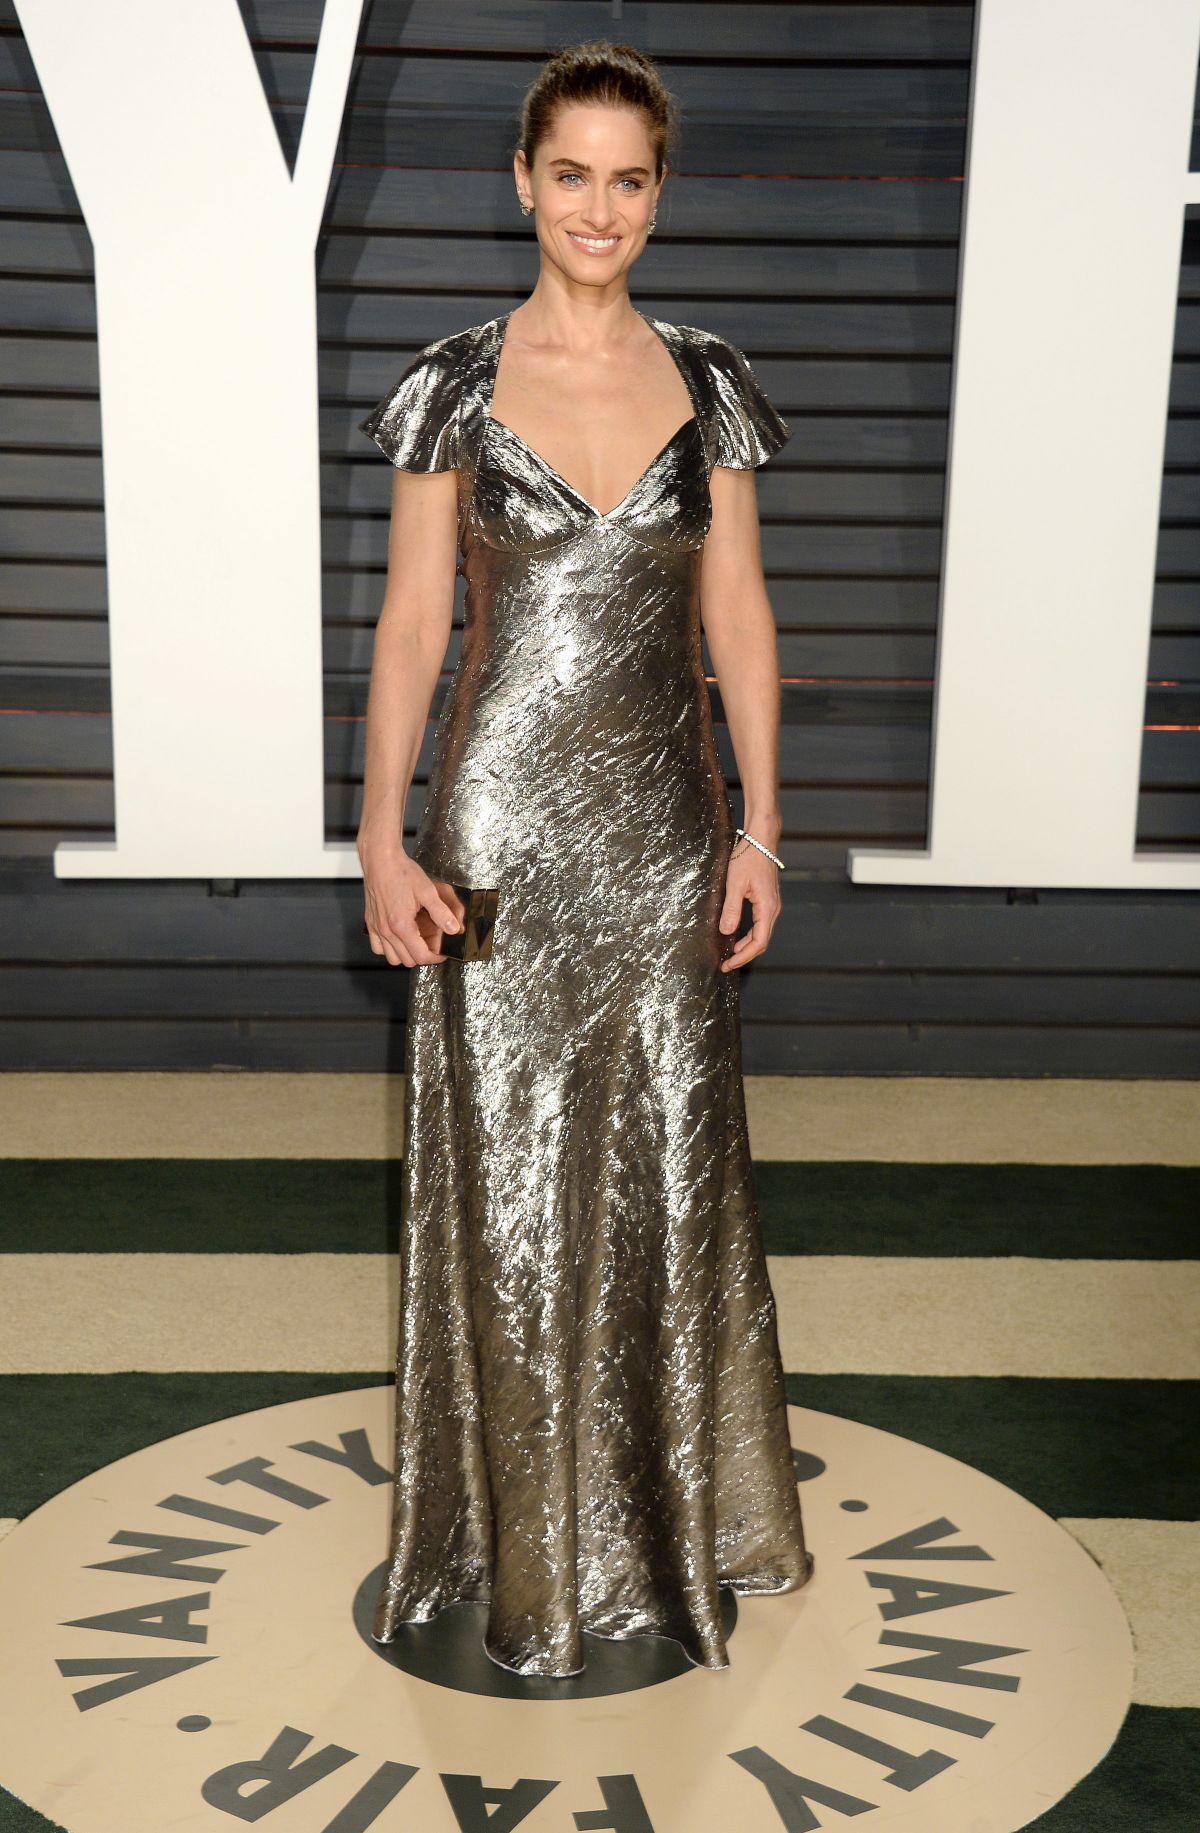 AMANDA PEET at 2017 Vanity Fair Oscar Party in Beverly Hills 02/26/2017